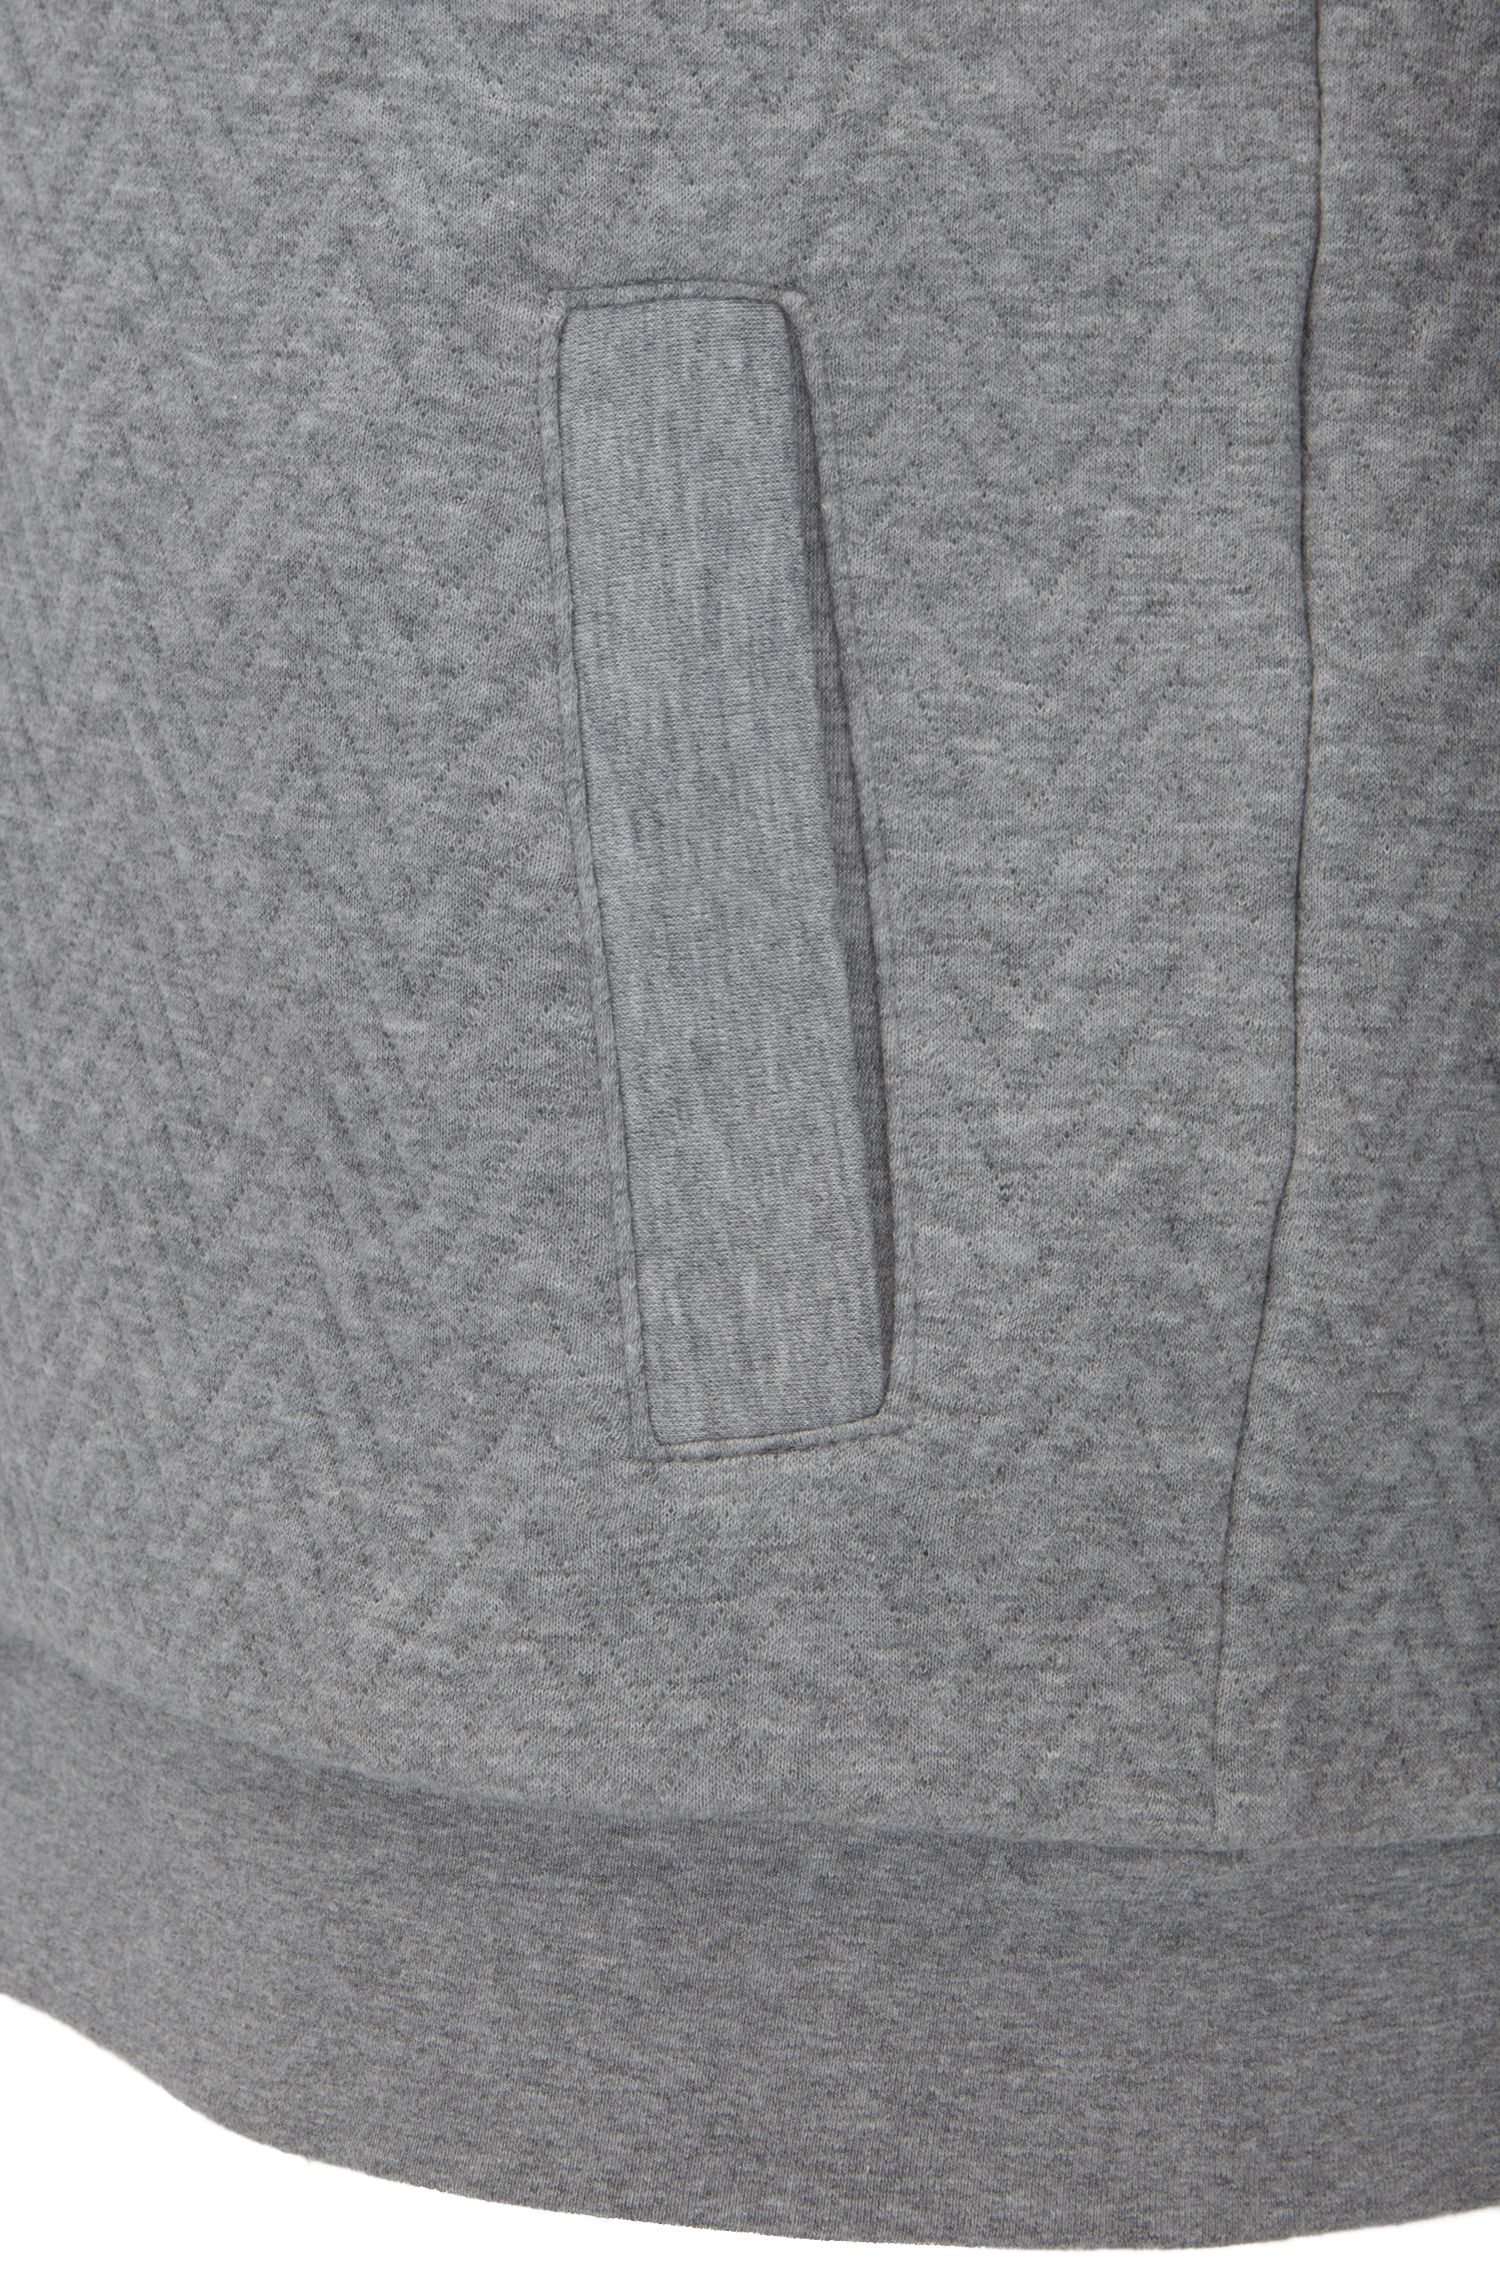 Chaqueta regular fit en algodón con capucha y guateado de espiga